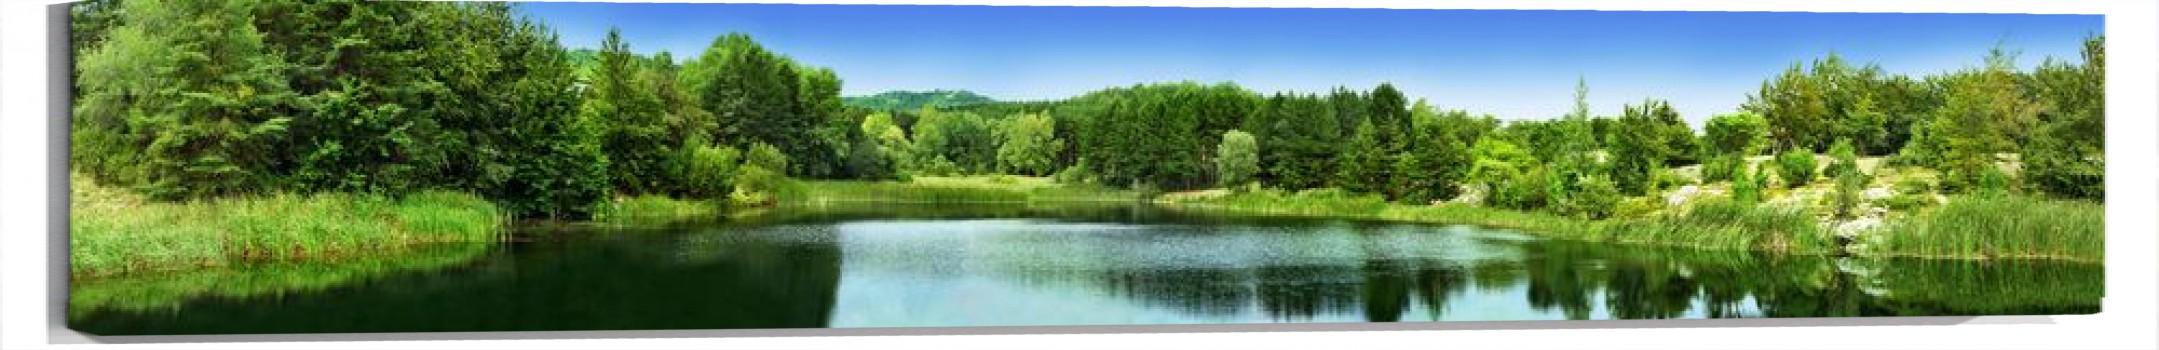 Lago_panoramica_muralesyvinilos_5831070__XXL.jpg